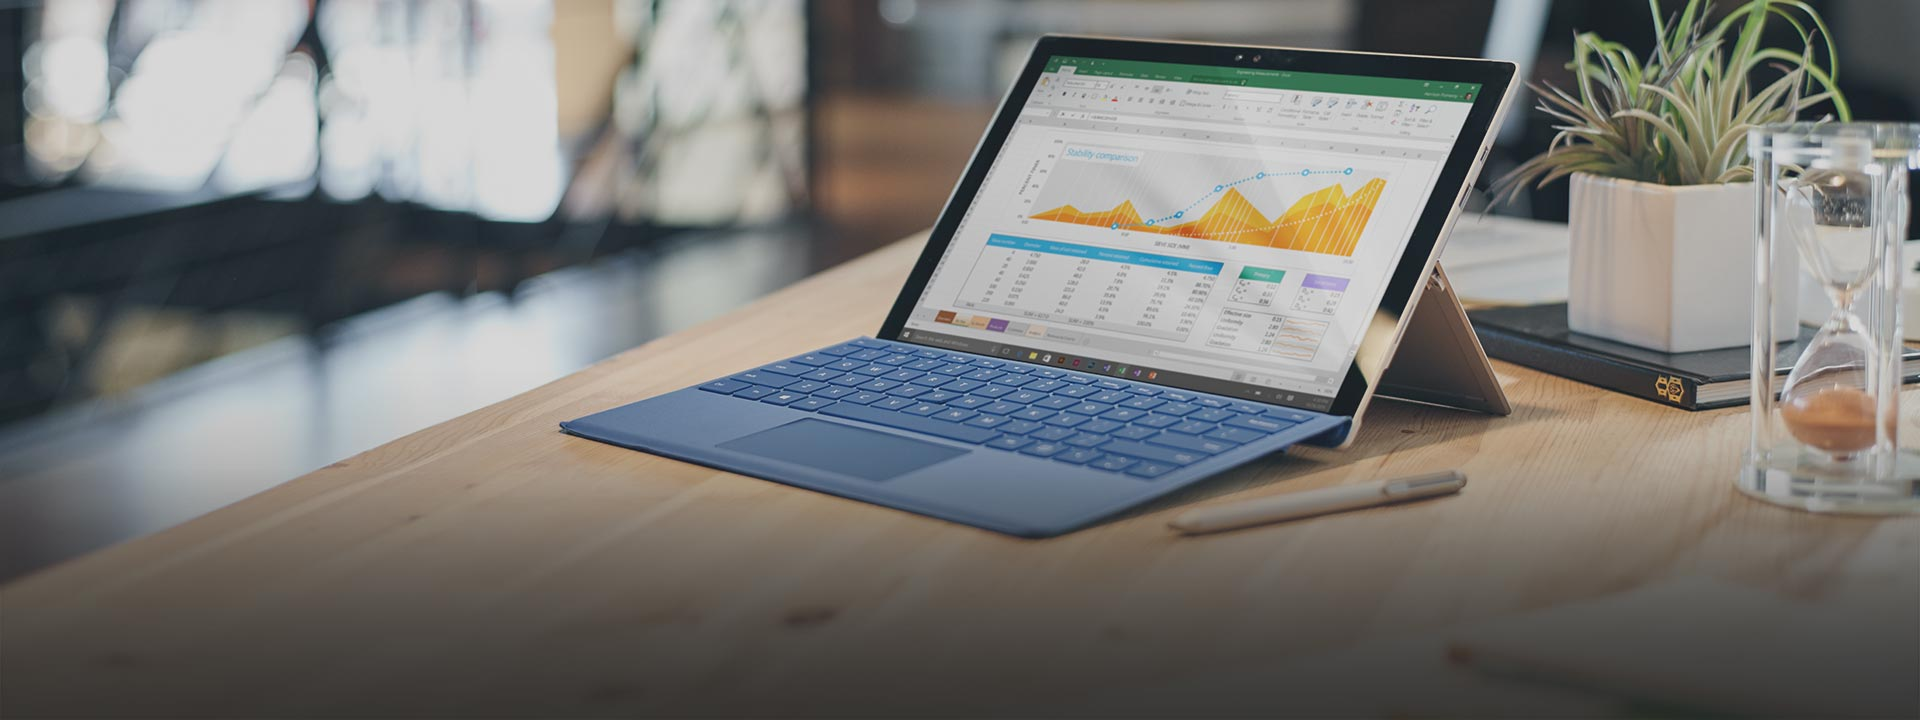 Surface Pro 4, läs mer